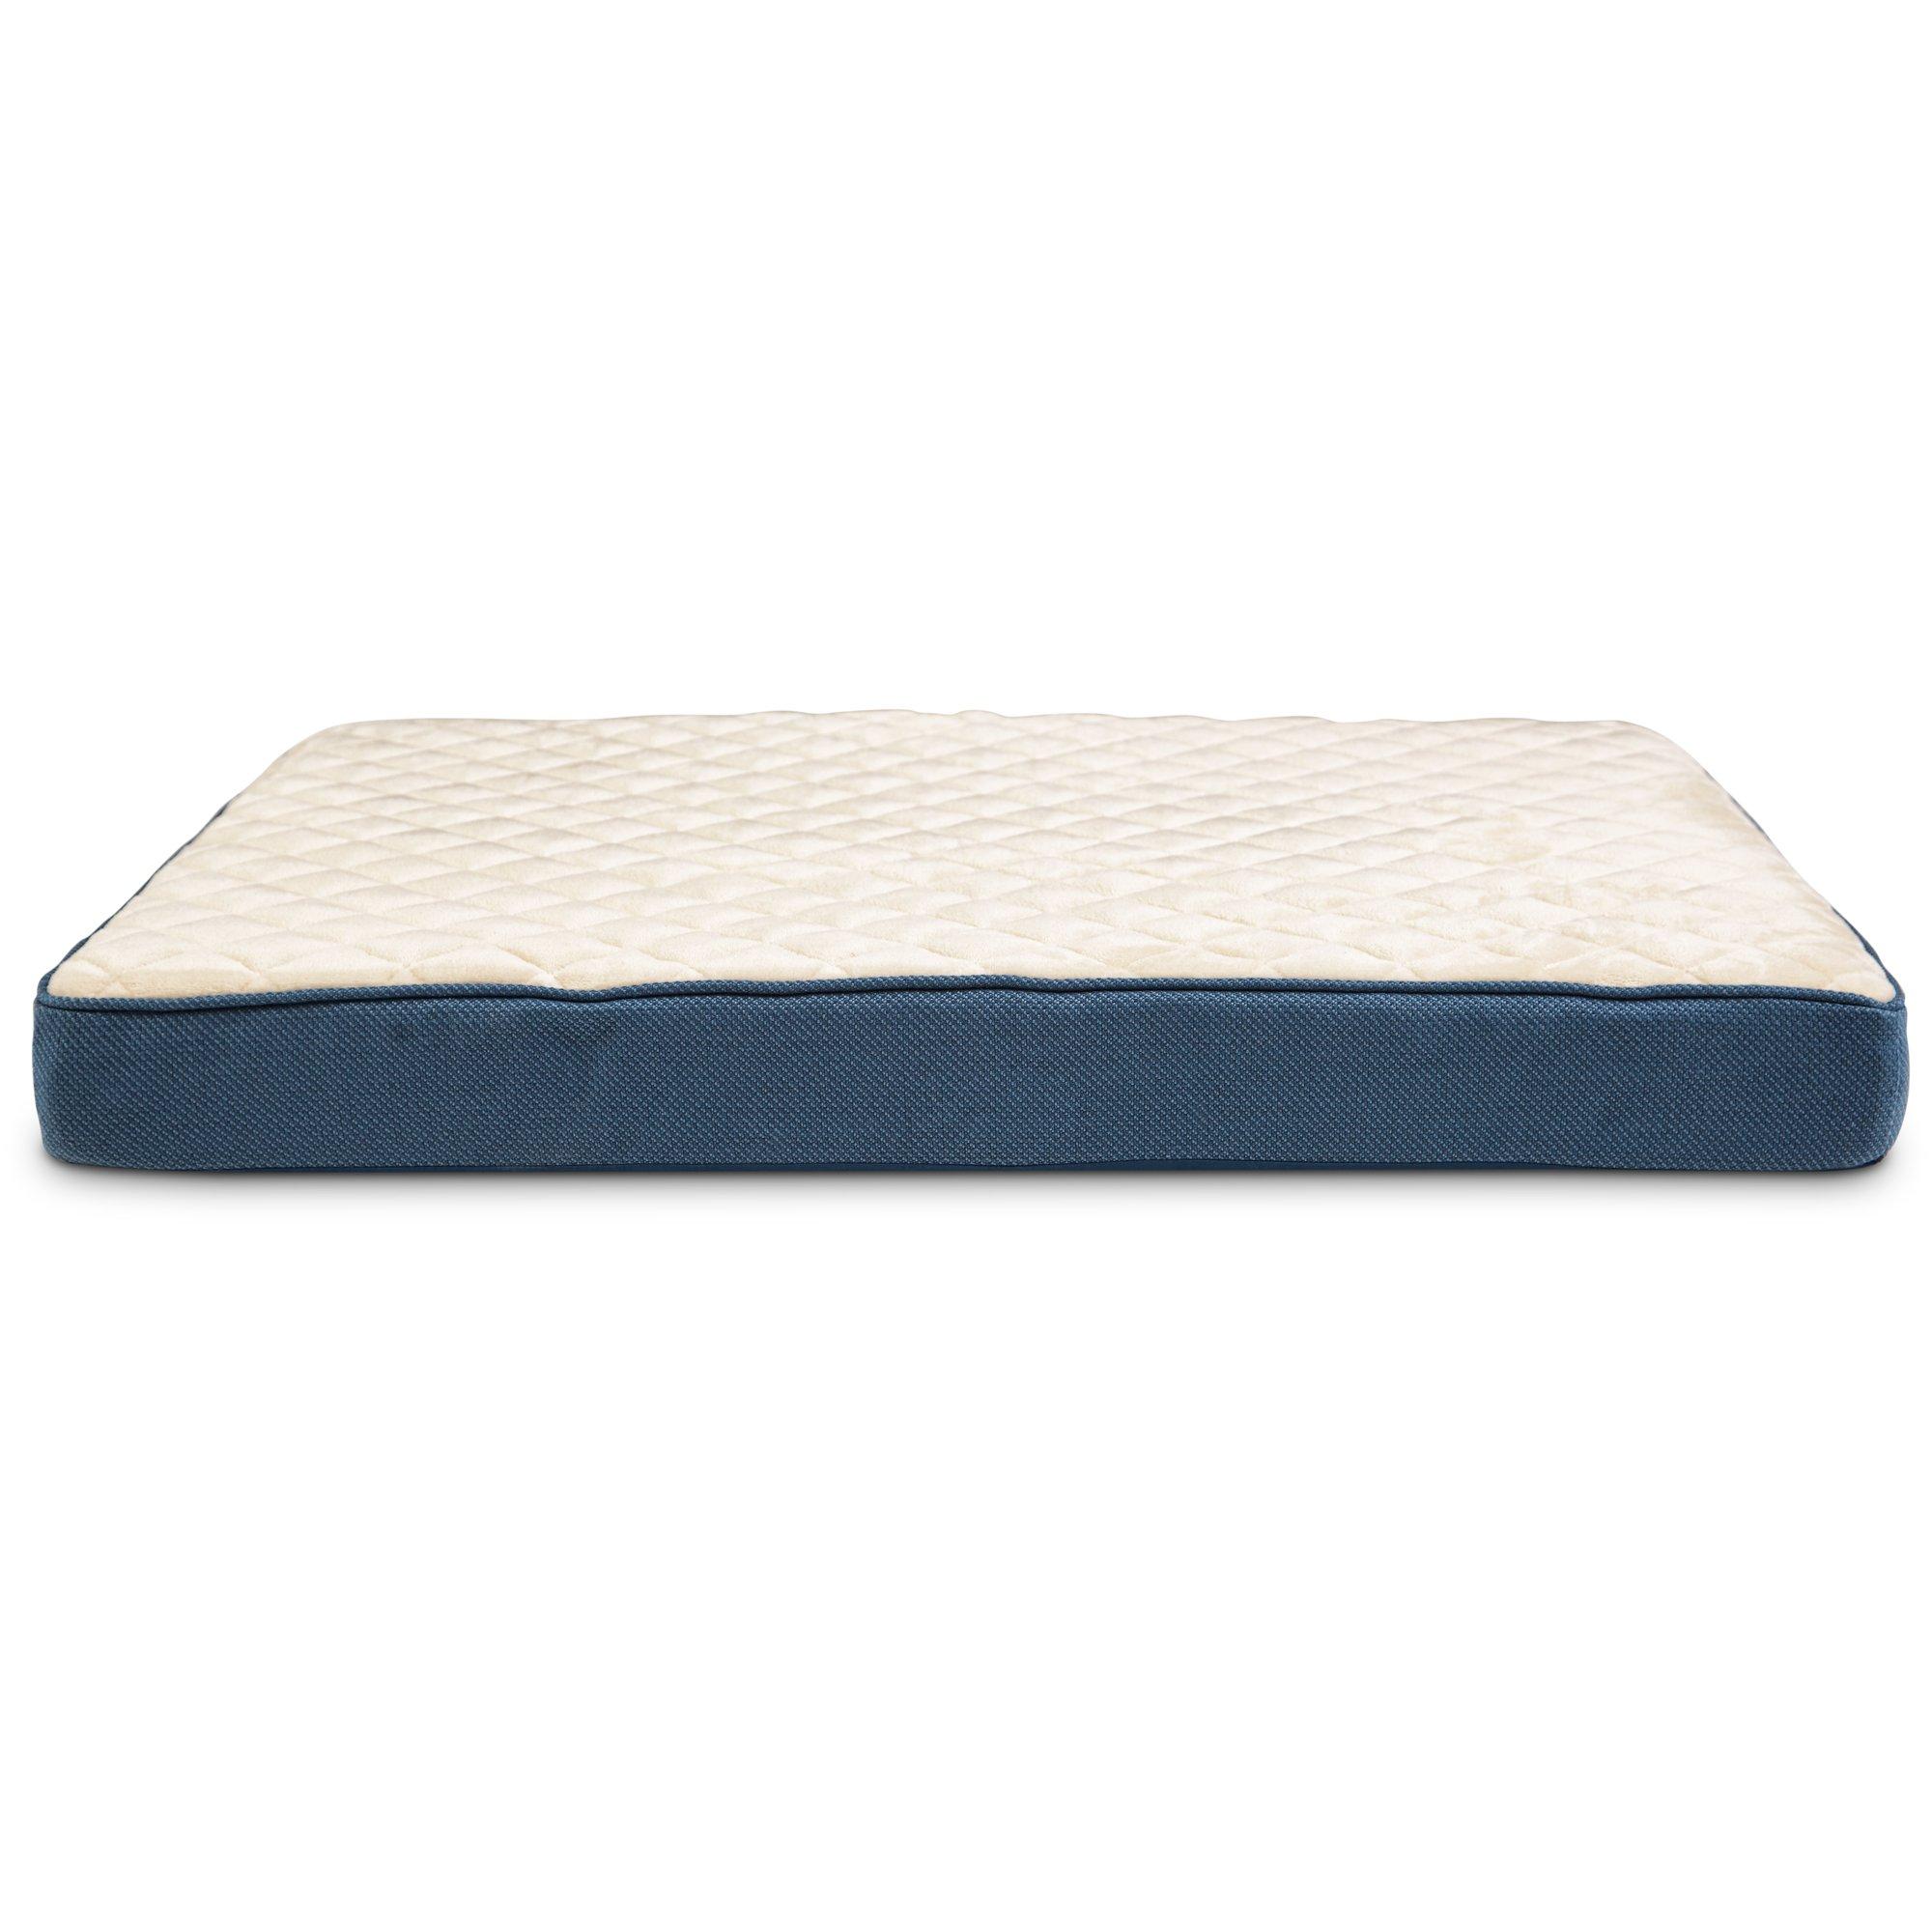 sml removable dog deluxe grey en bed sleepy tweed cover